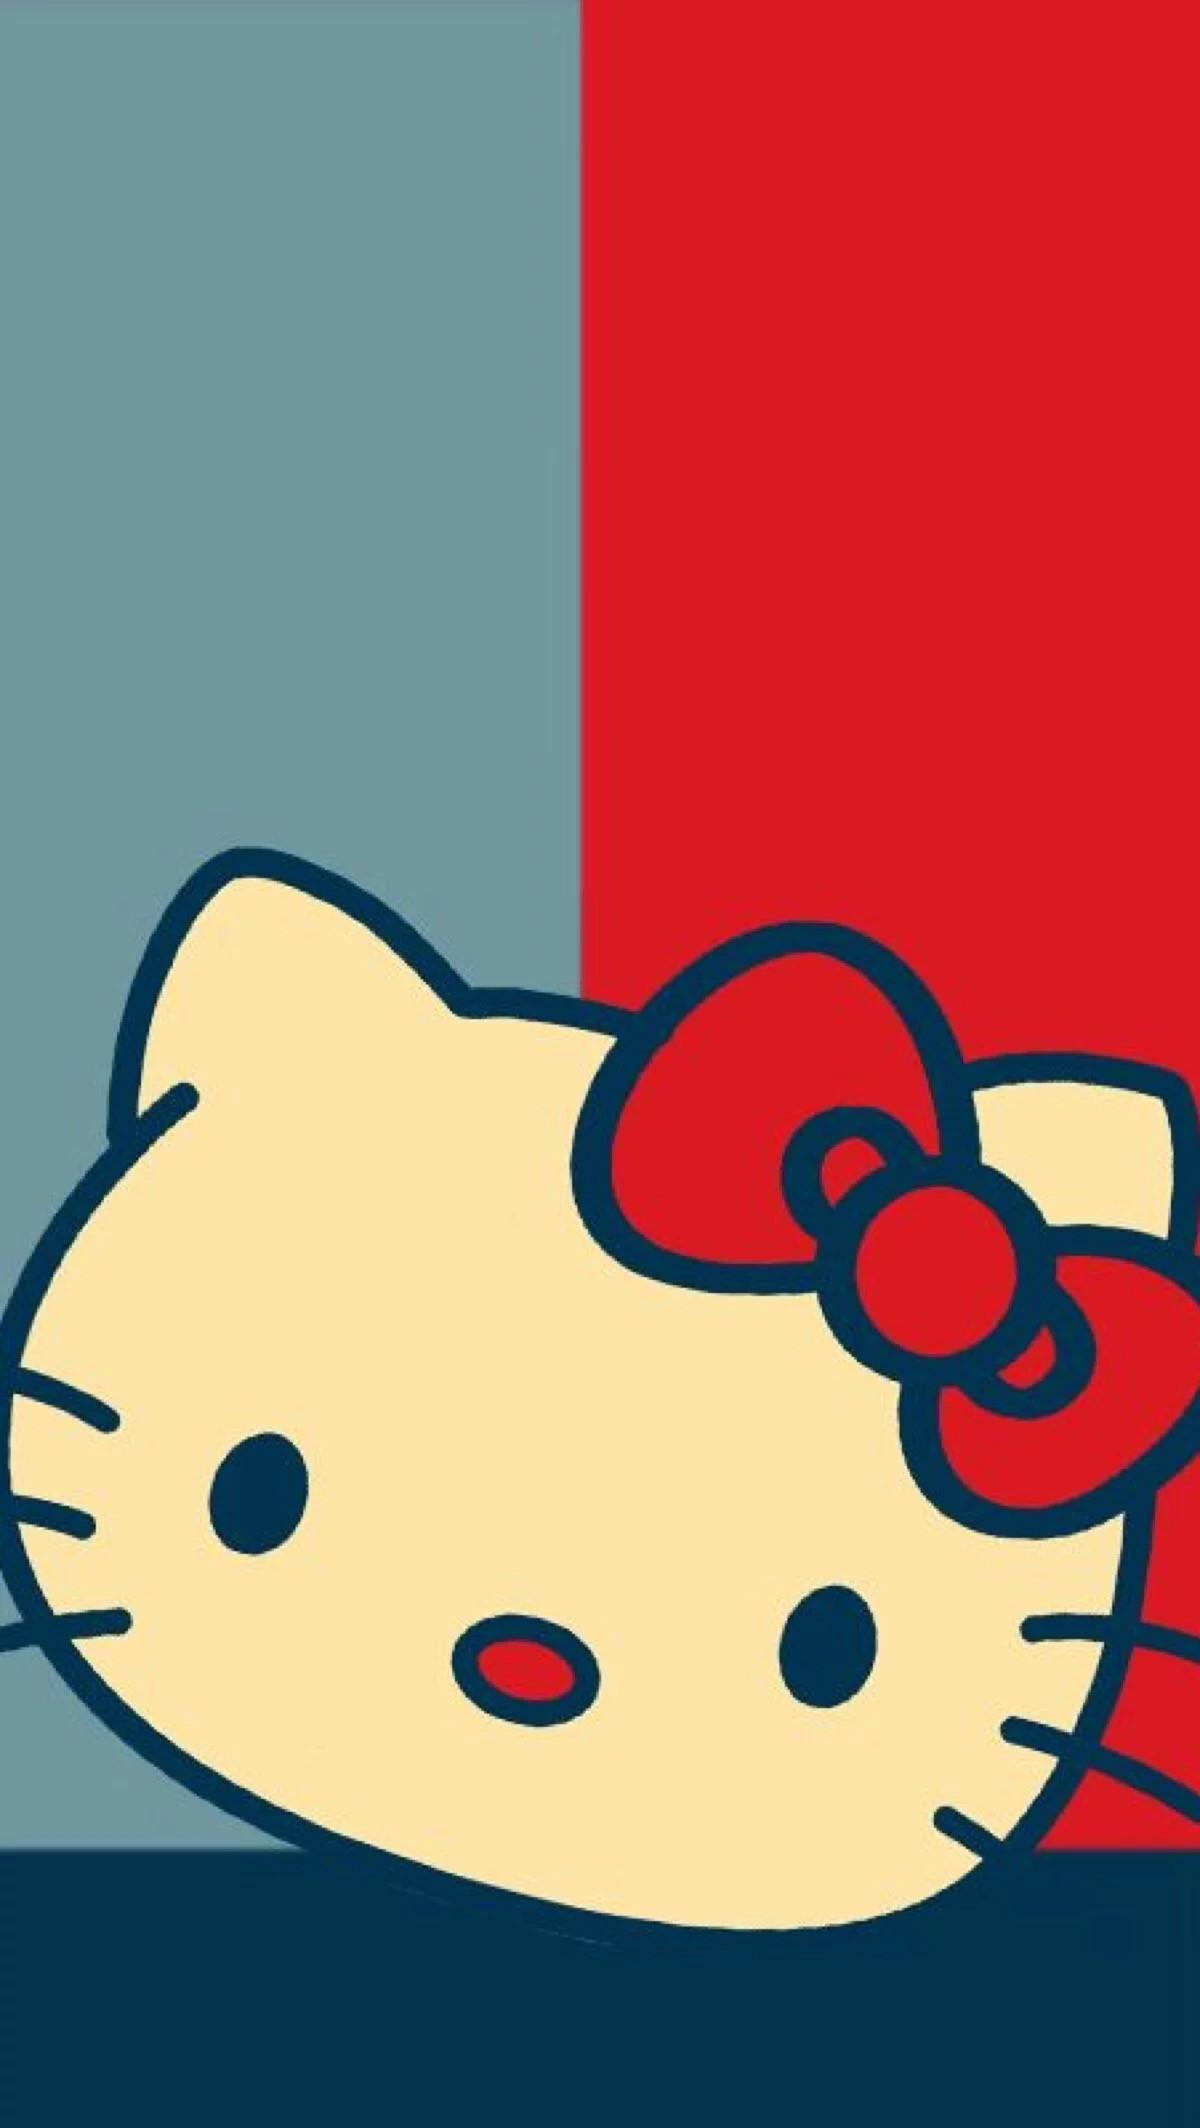 Kitty Wallpaper, Iphone 6